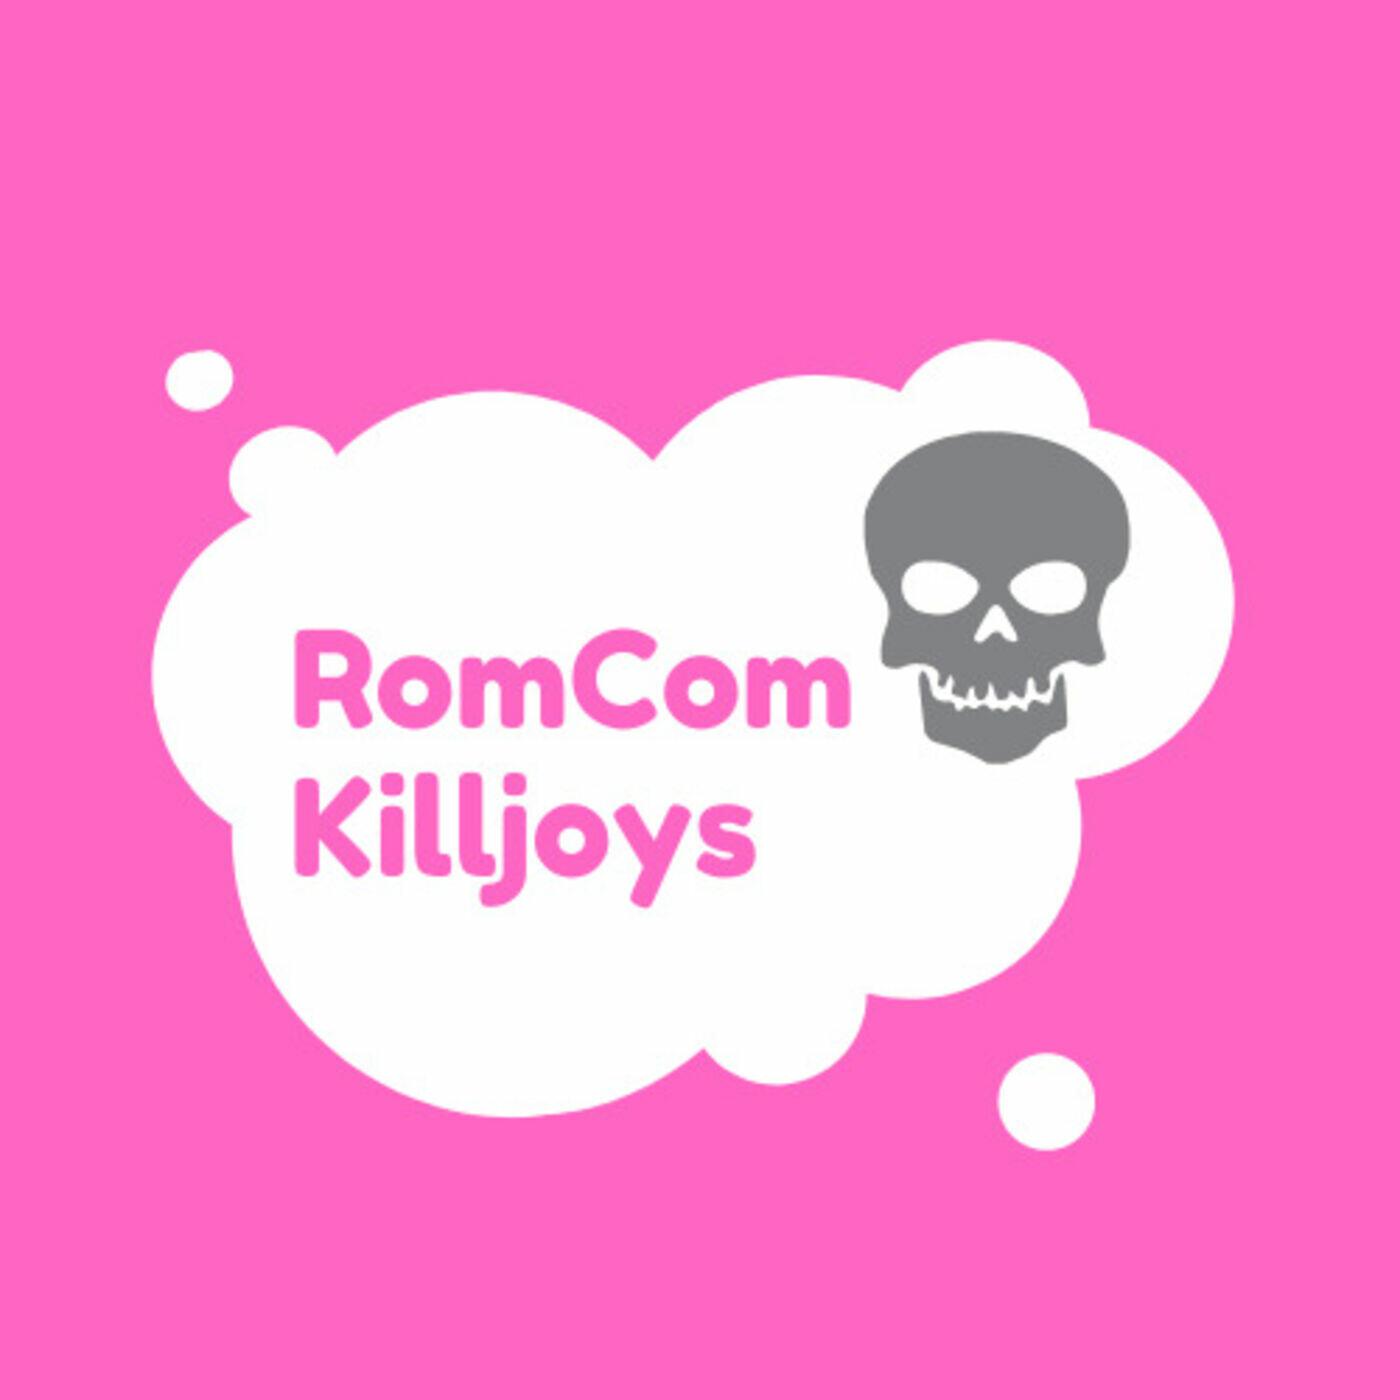 RomCom Killjoys